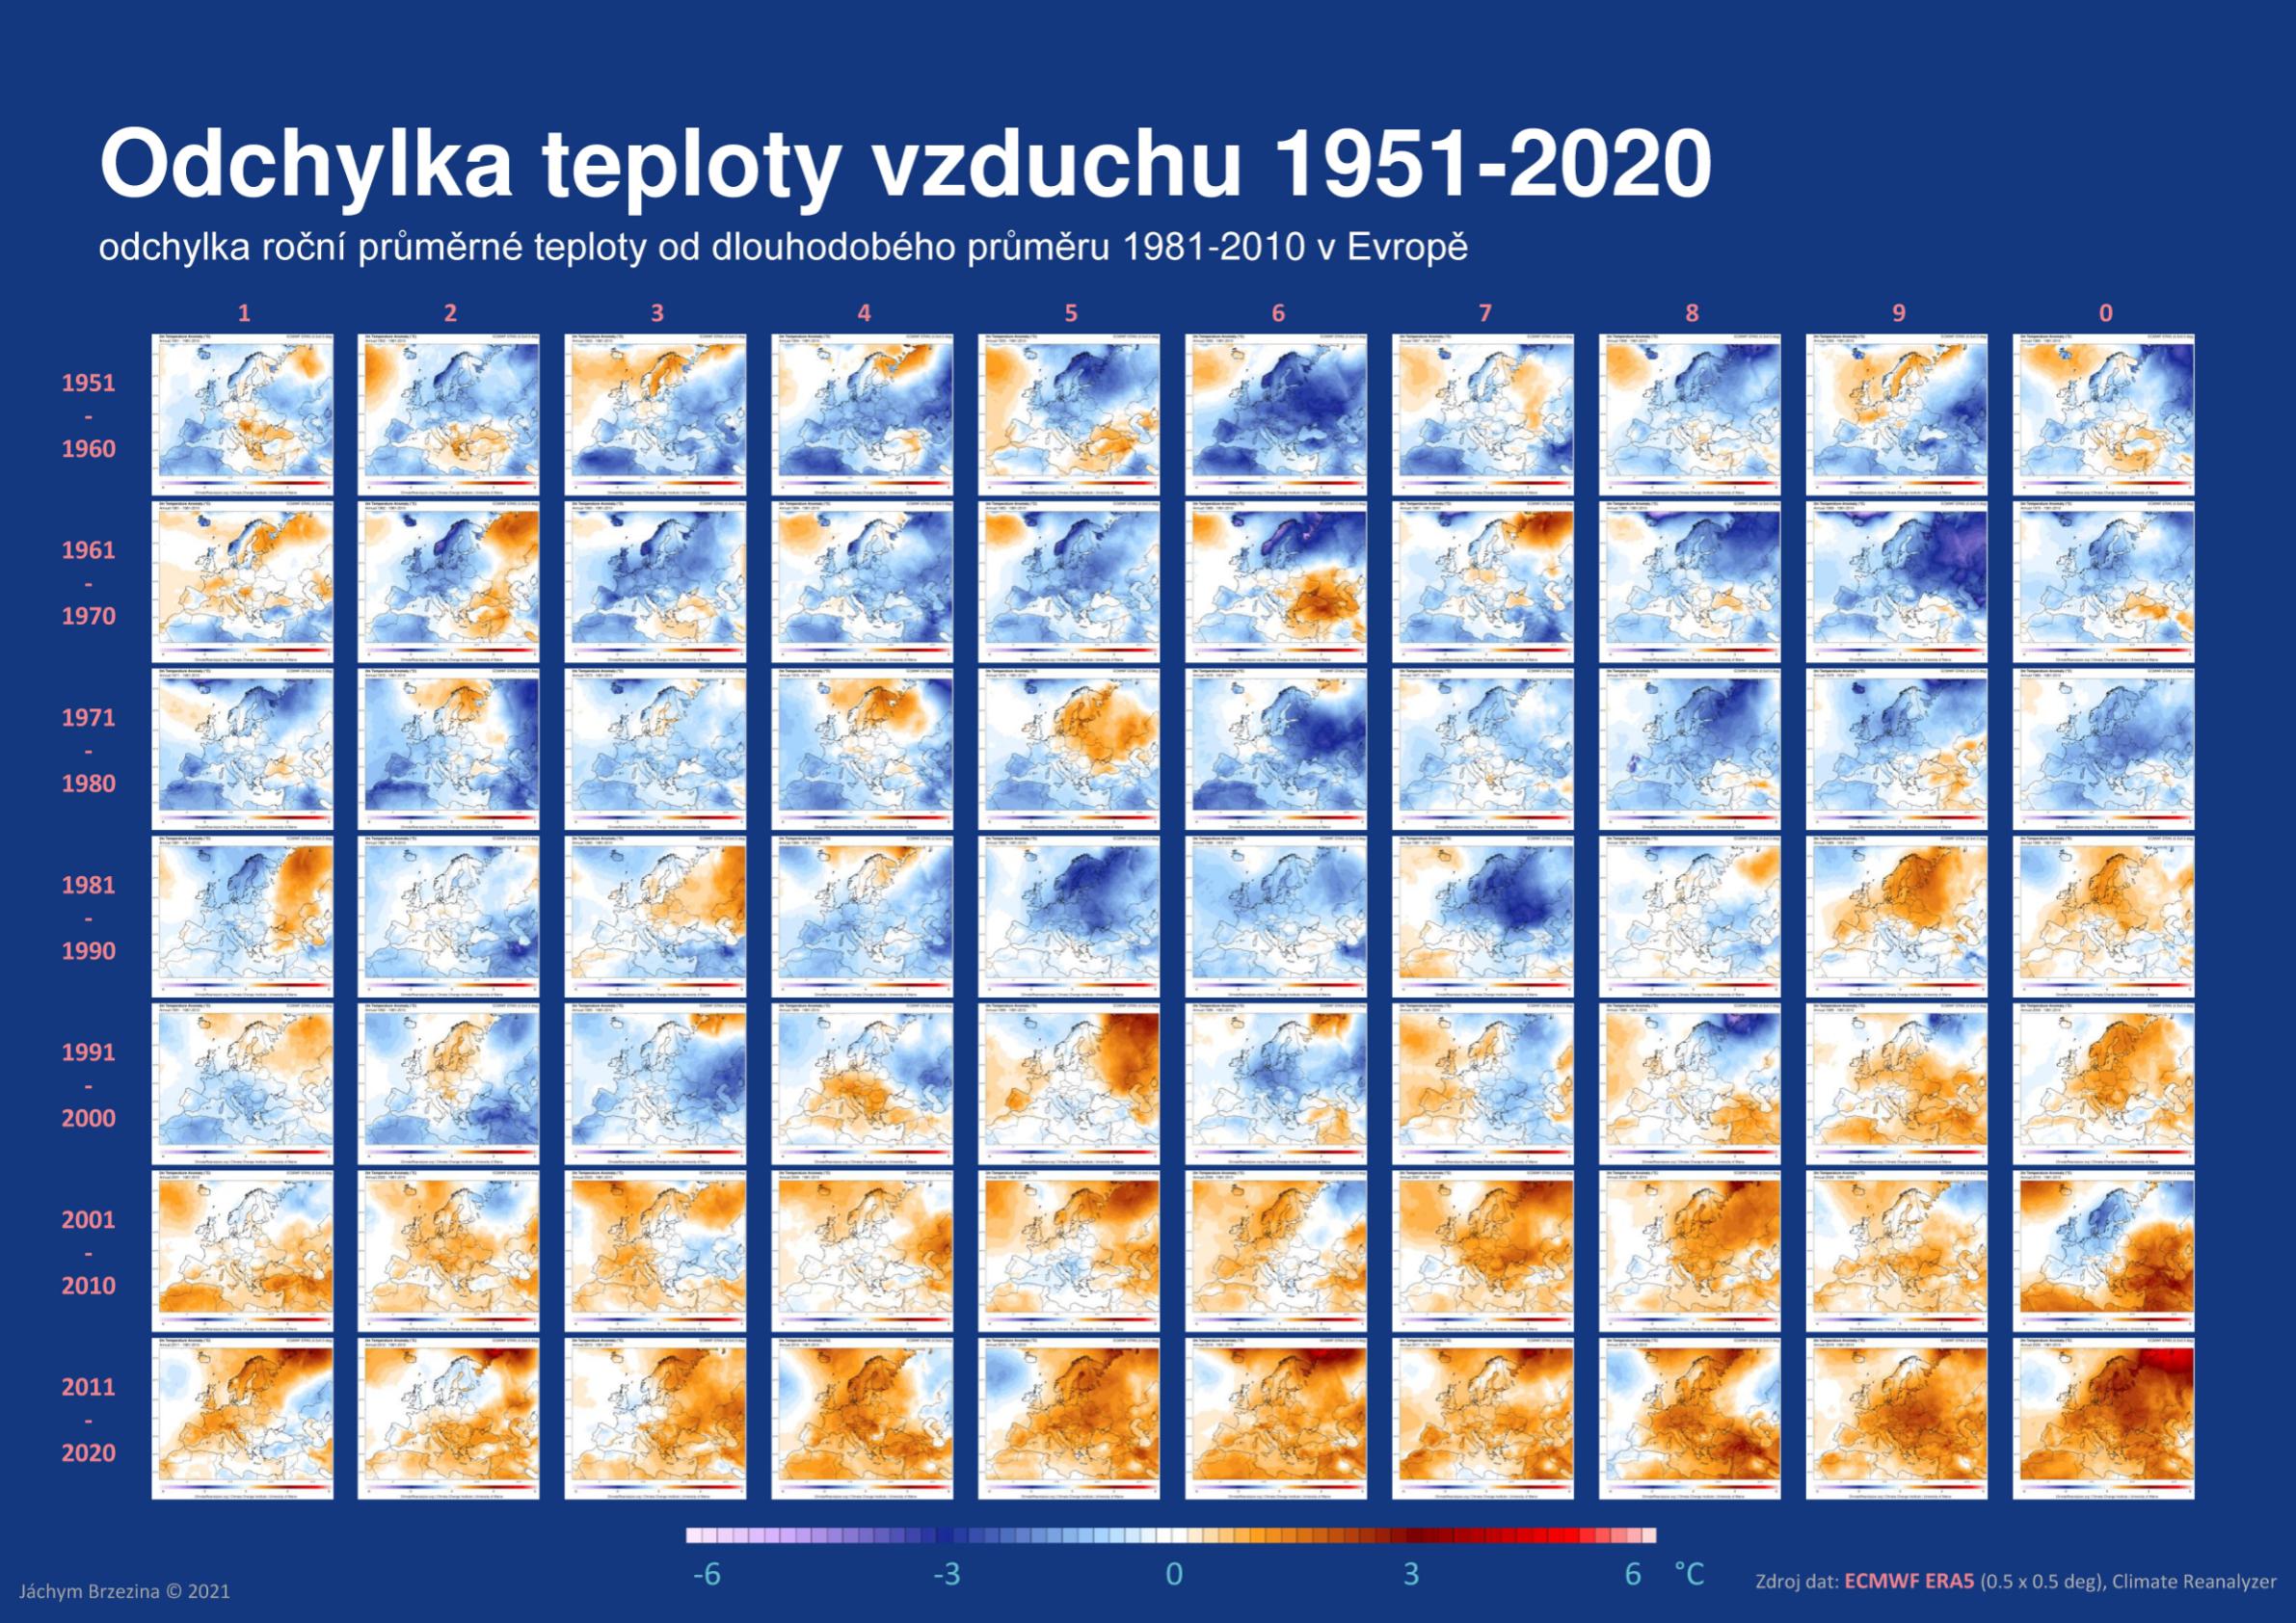 Odchylka teploty vzduchu v Evropě 1951-2020*